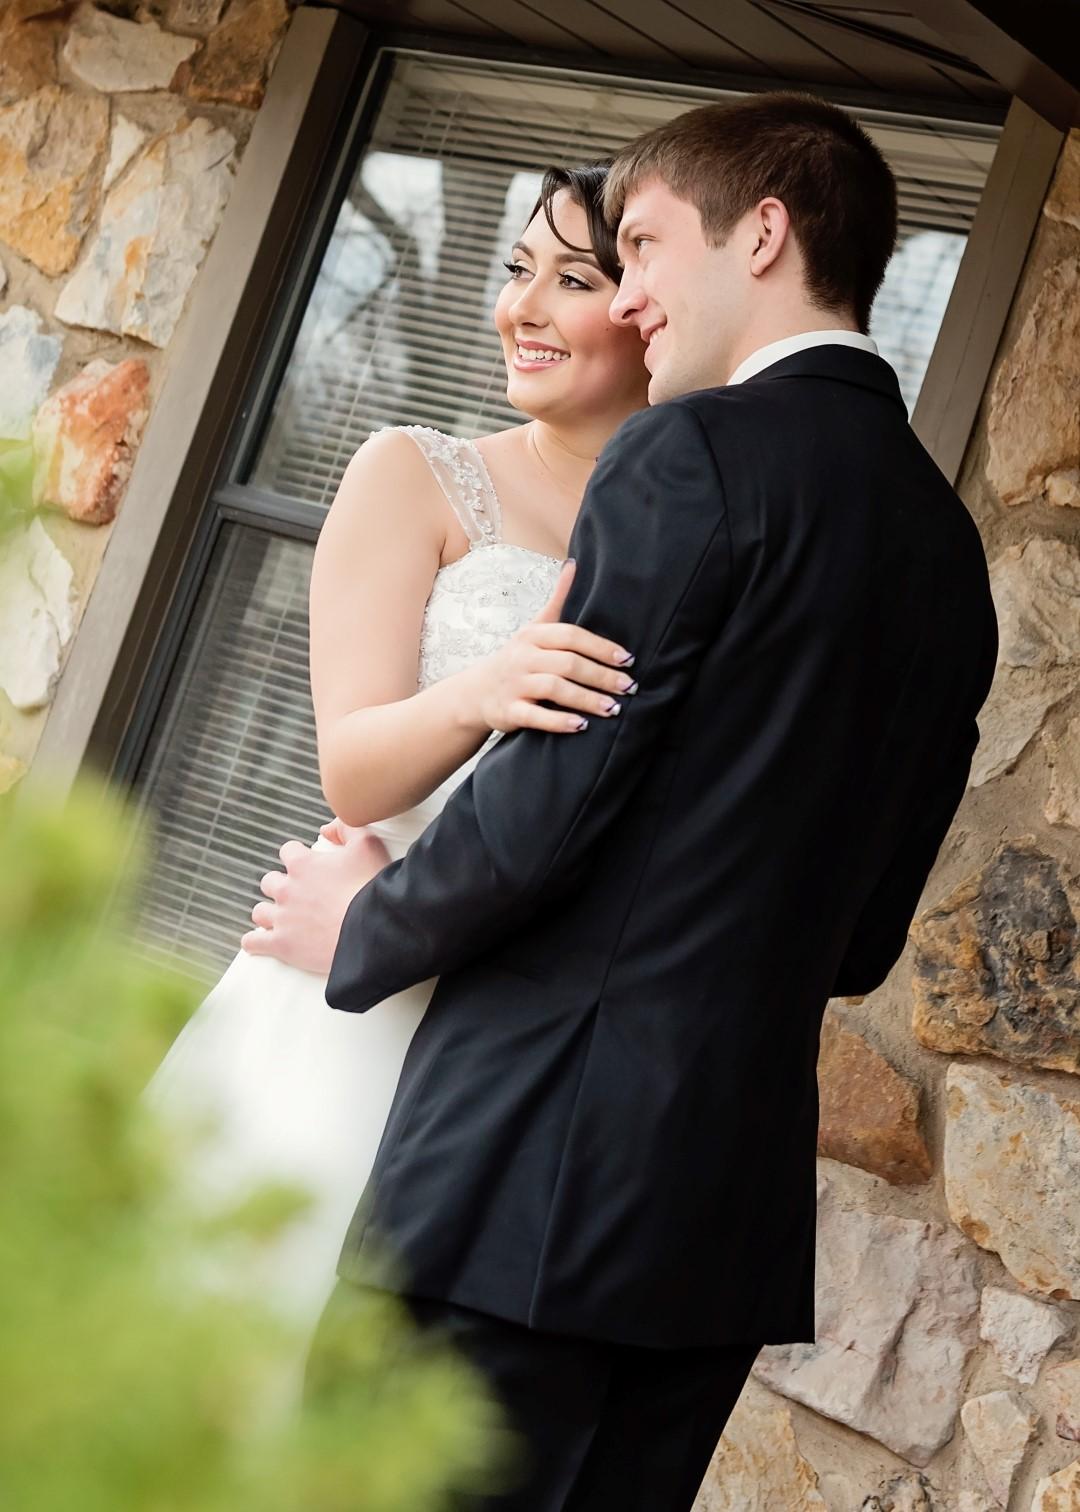 Haught Wedding 07 (Large).jpg